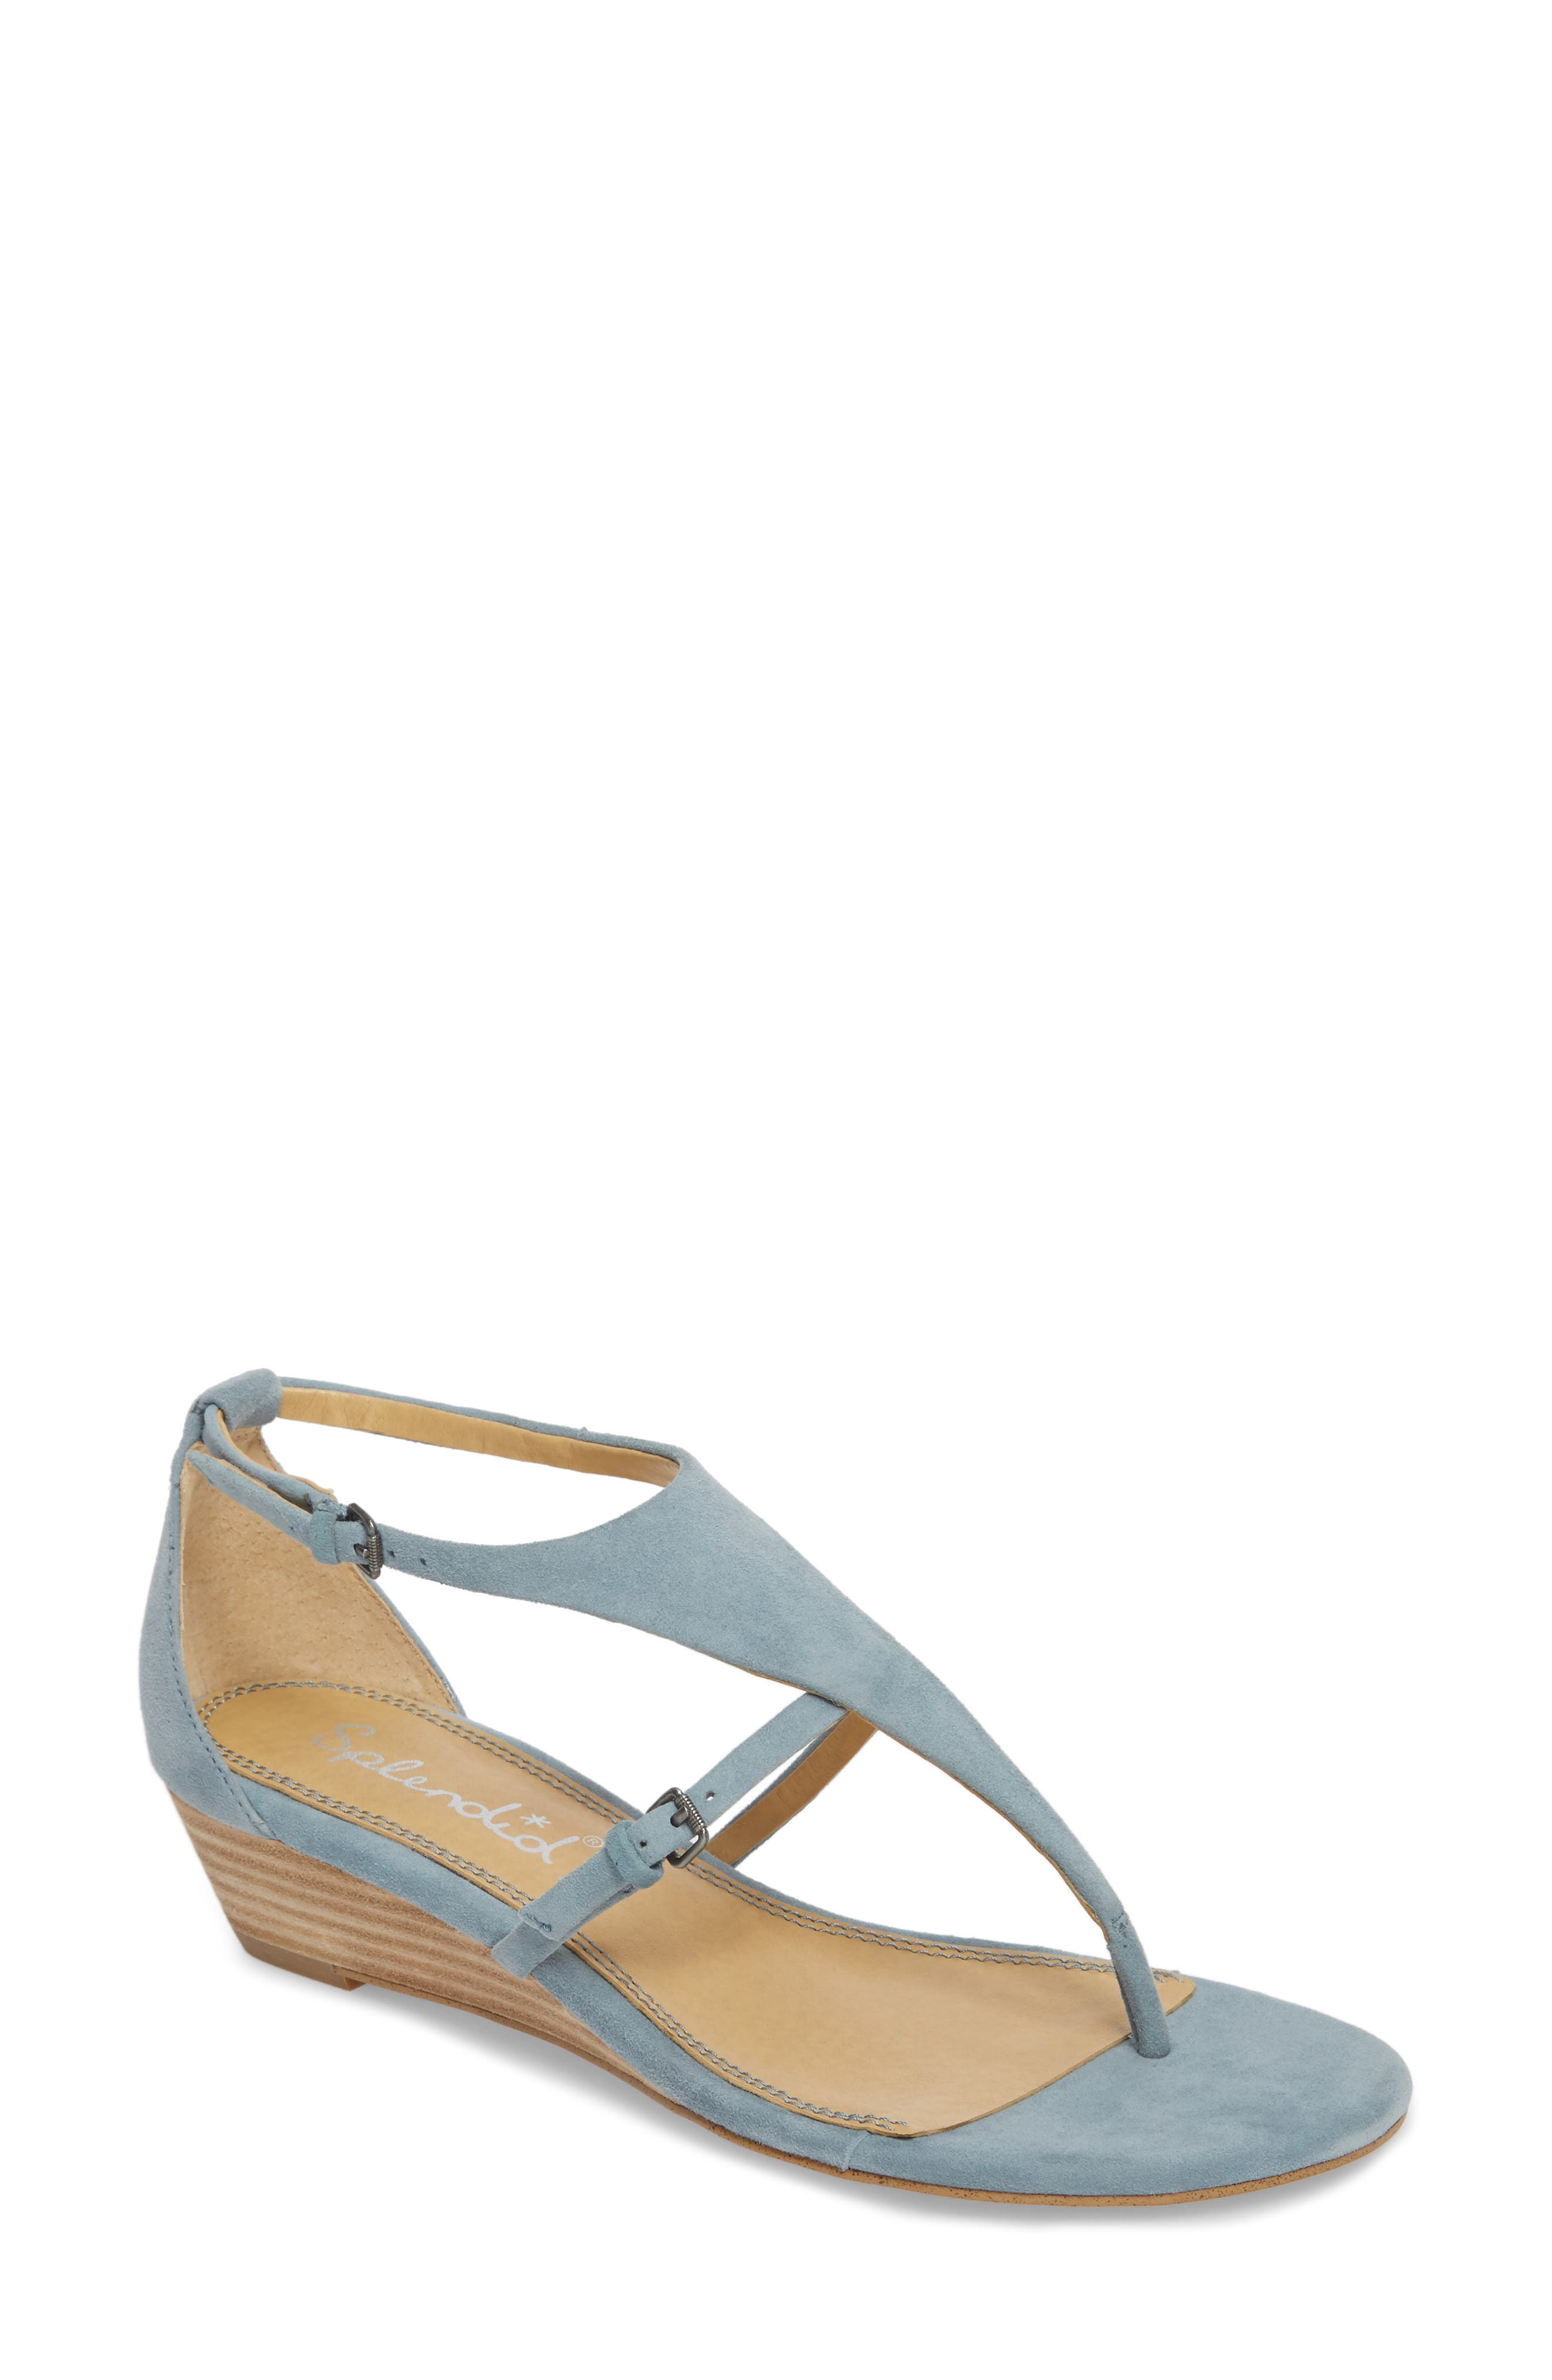 Brooklyn V-Strap Wedge Sandal,                             Main thumbnail 4, color,